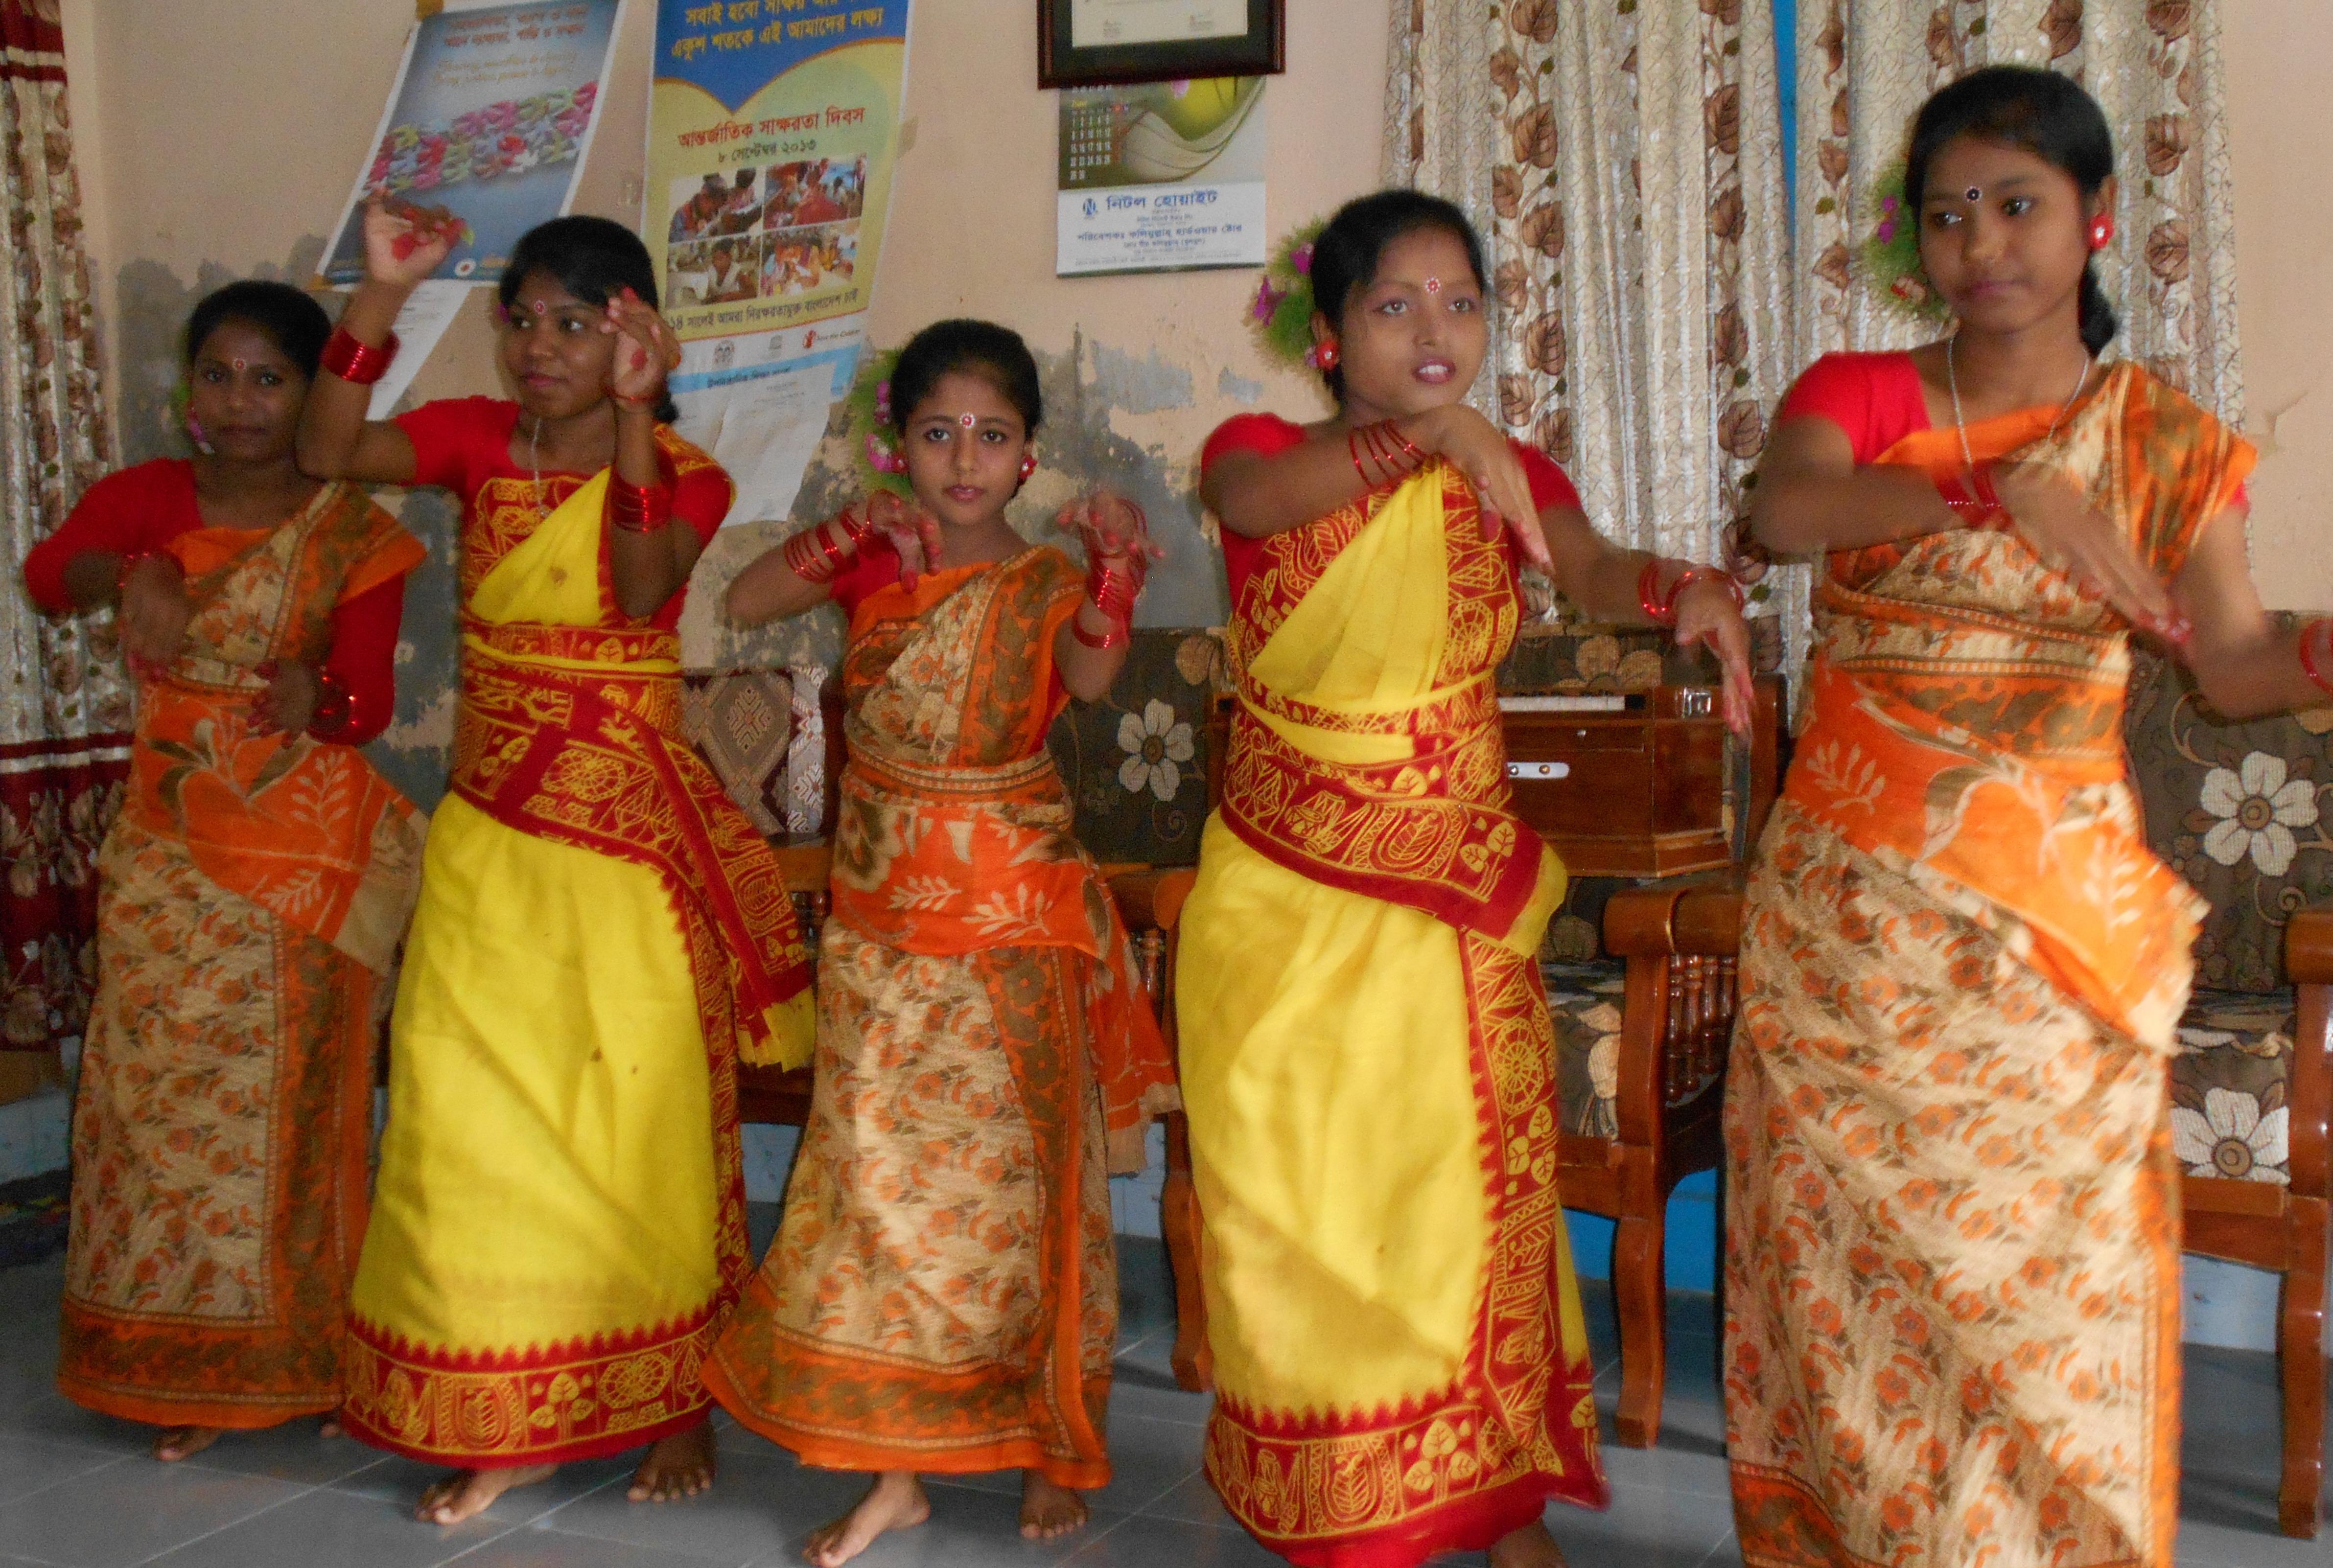 Santal dancers celebrating.